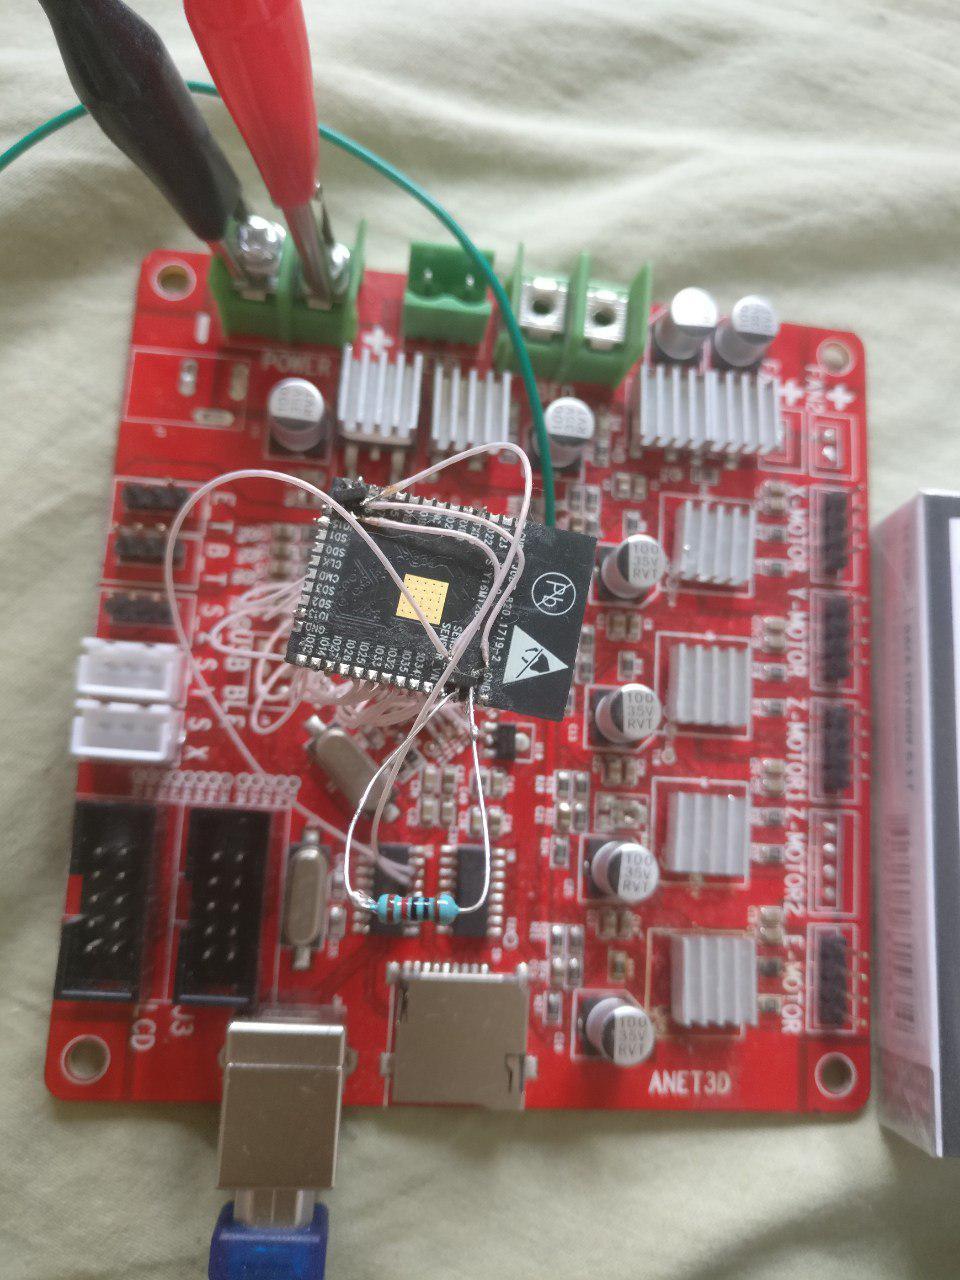 Developers Esp32 32 Bit Hal Reprap Ramps 14 Wiring Nwreprapcom Youtube Photo 2018 08 06 15 11 03